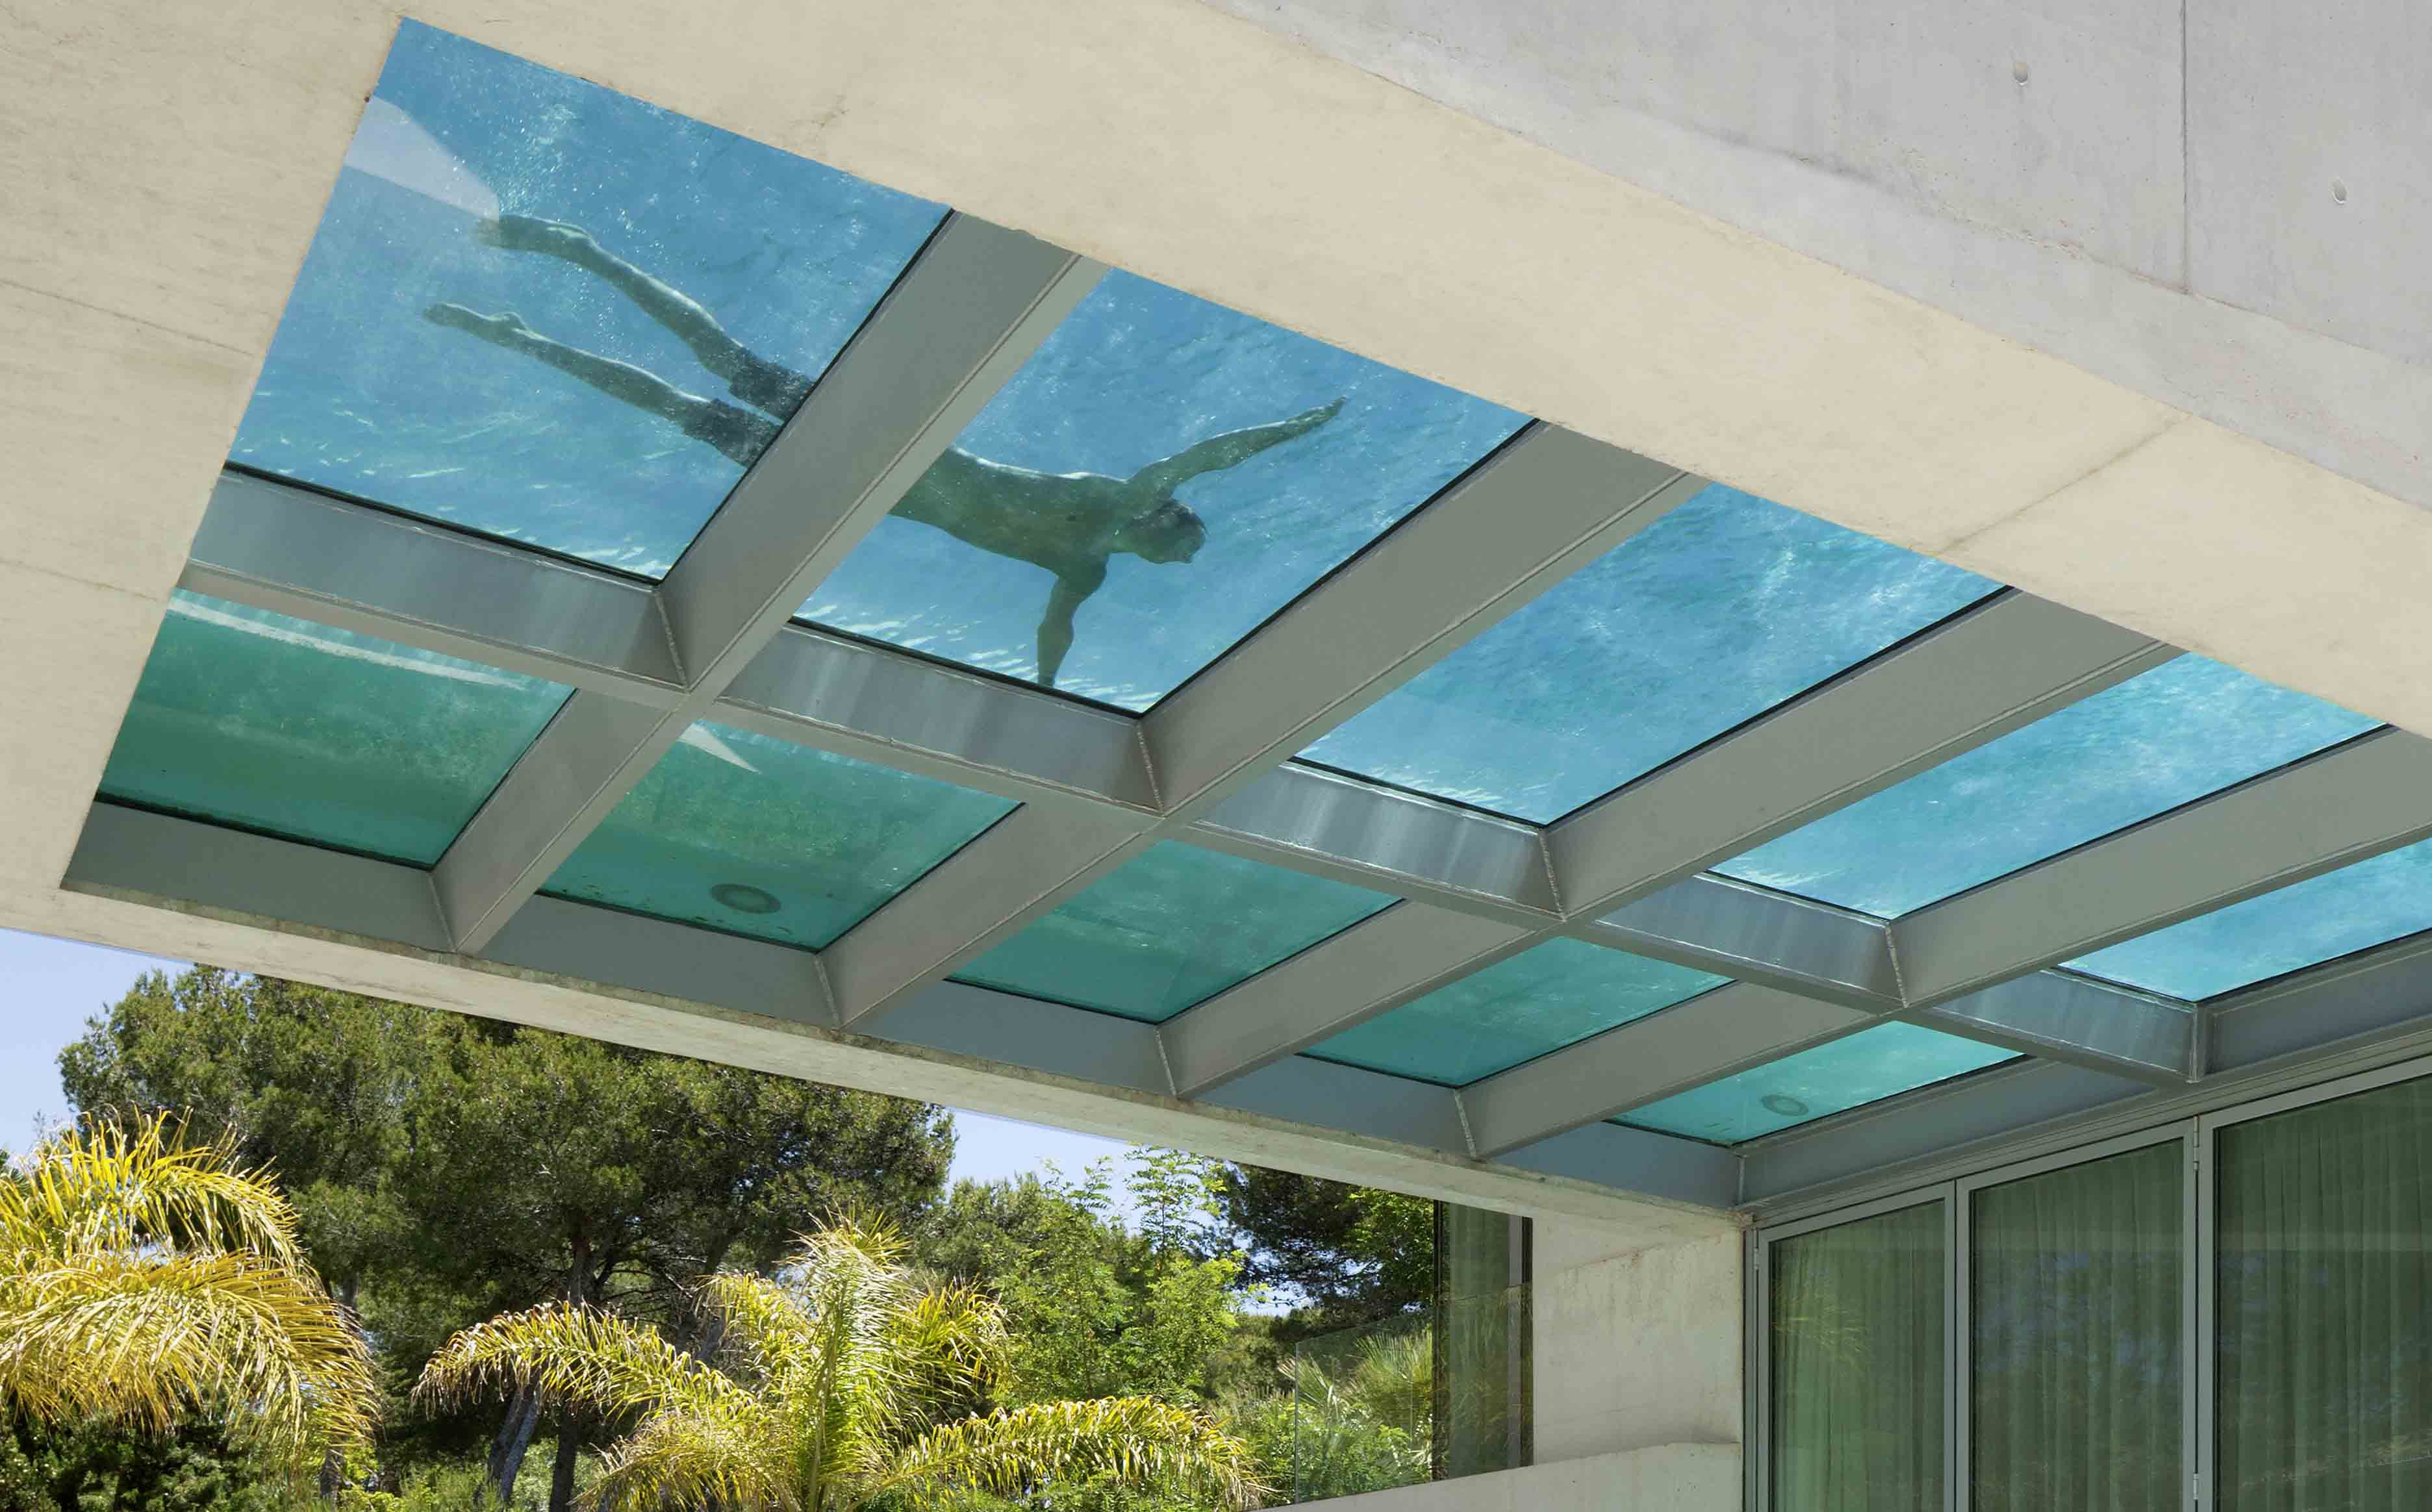 diseño de piscinas pequeñas para casas - buscar con google